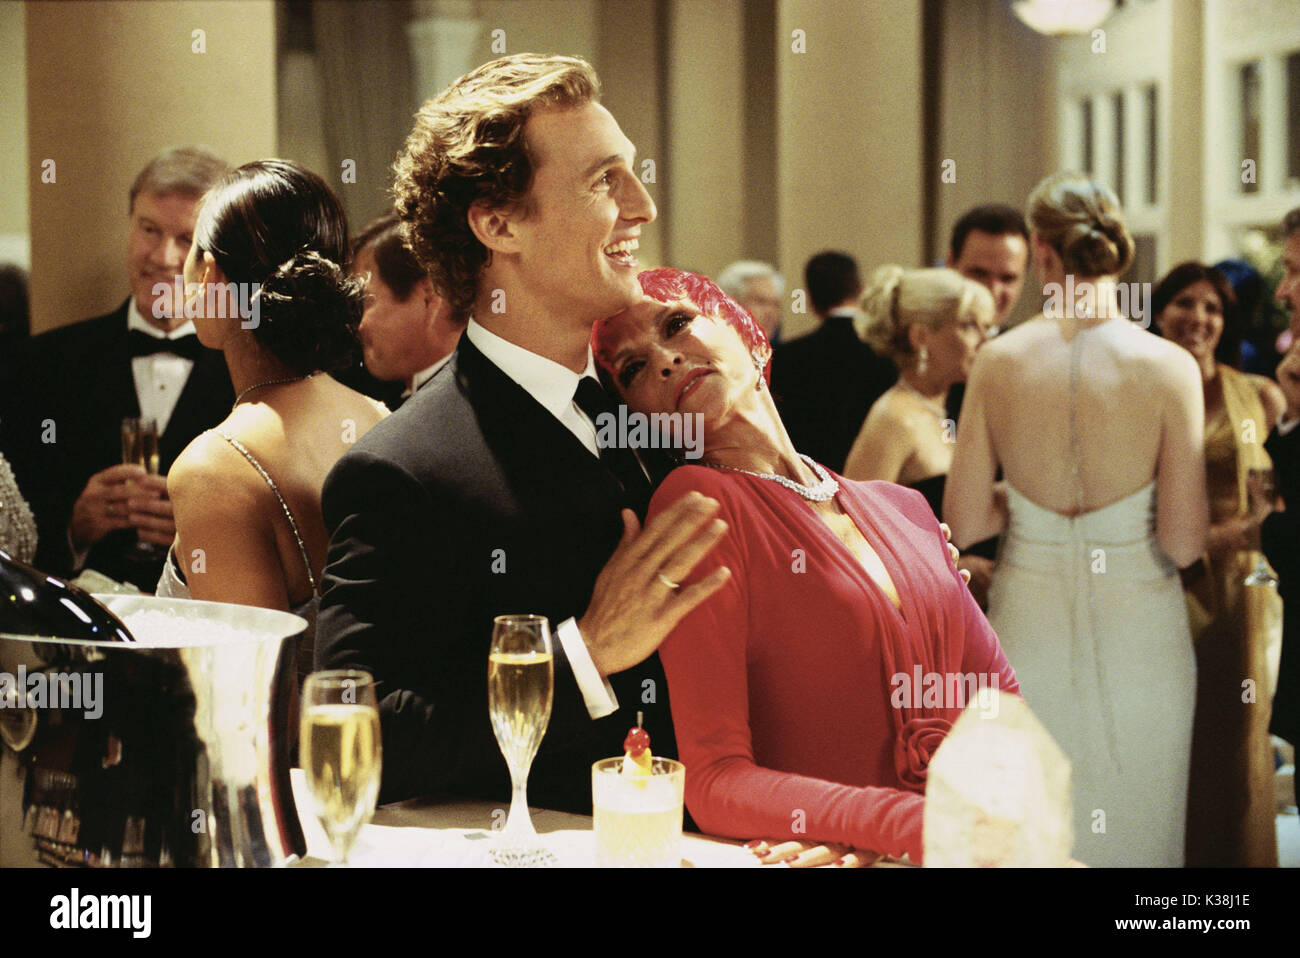 How To Lose A Guy In 10 Days Matthew Mcconaughey Liliane Montevecchi Stock Photo Alamy